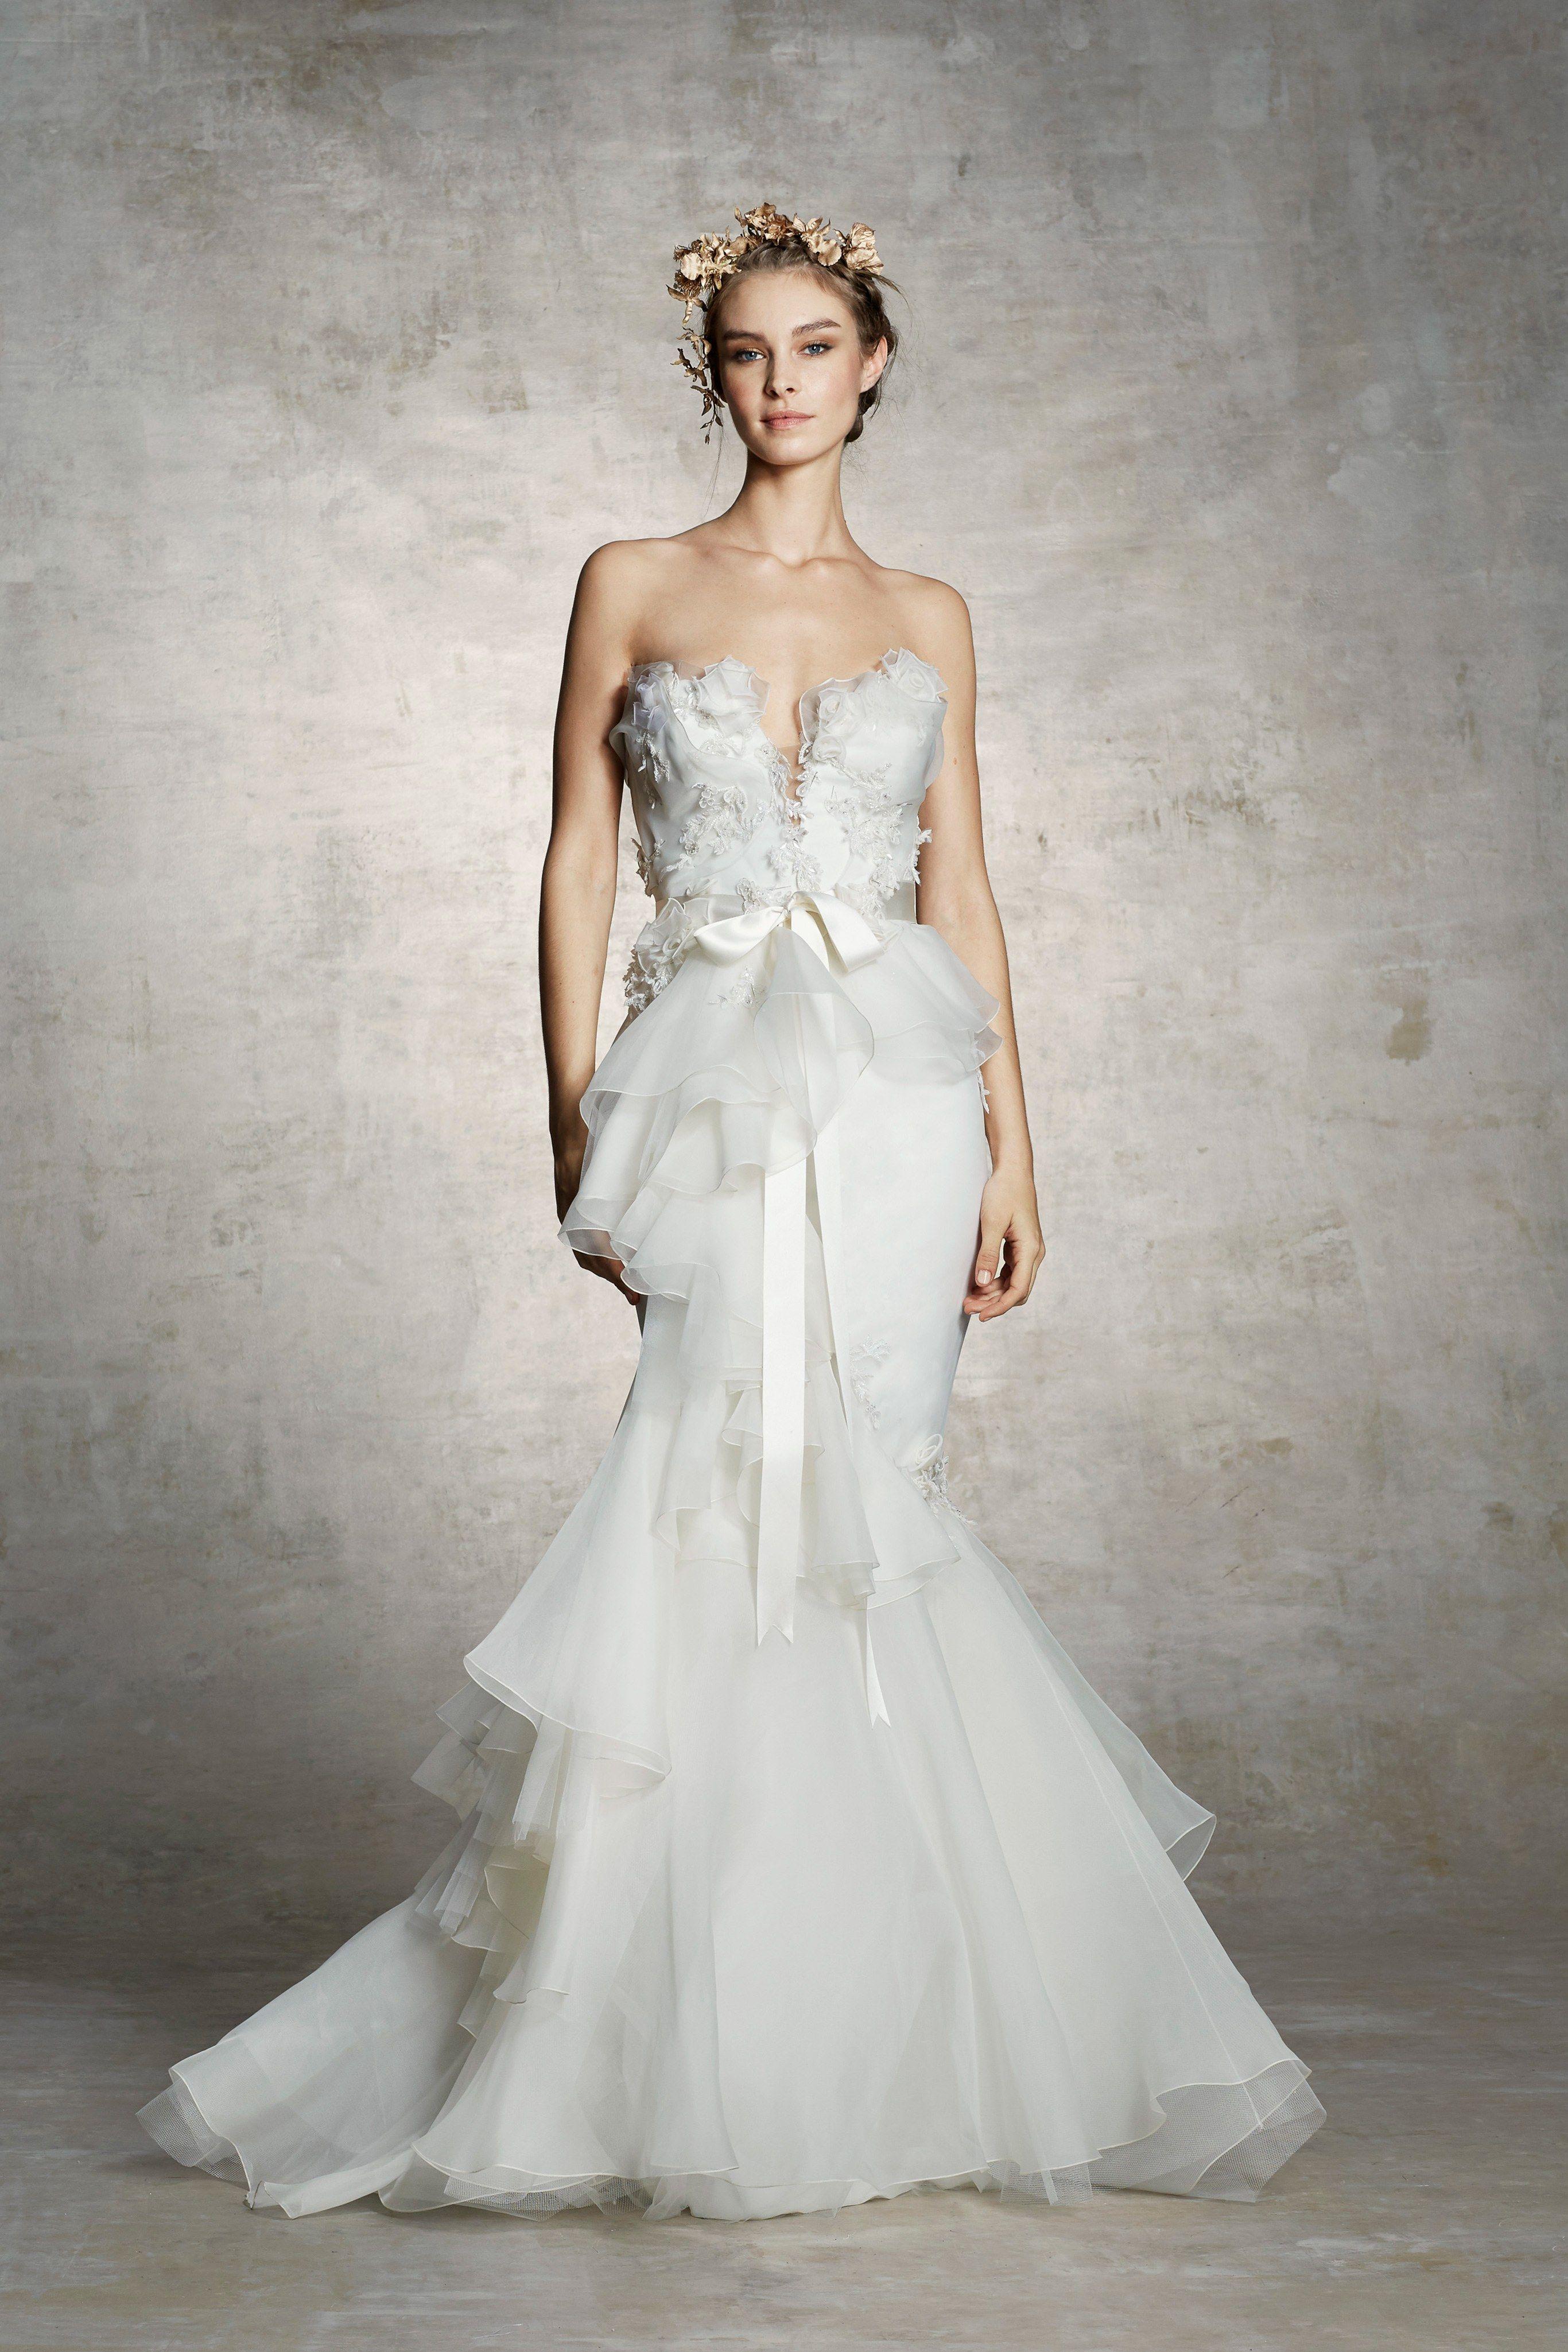 Marchesa bridal spring fashion show current fashion shows and